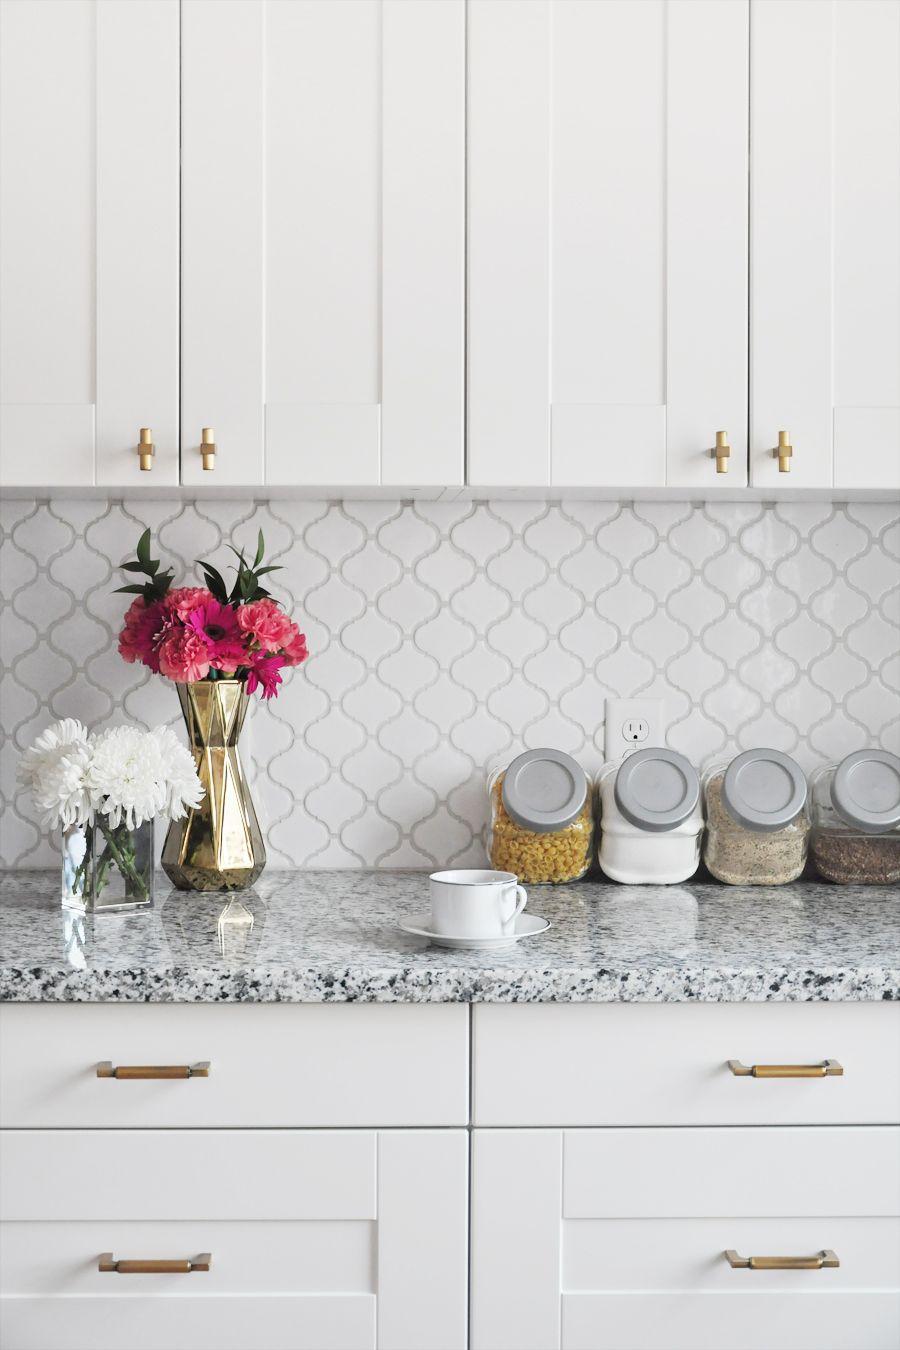 White Kitchen Backsplash Pos Display System How To Tile A Diy Tutorial Sponsored By Wayfair